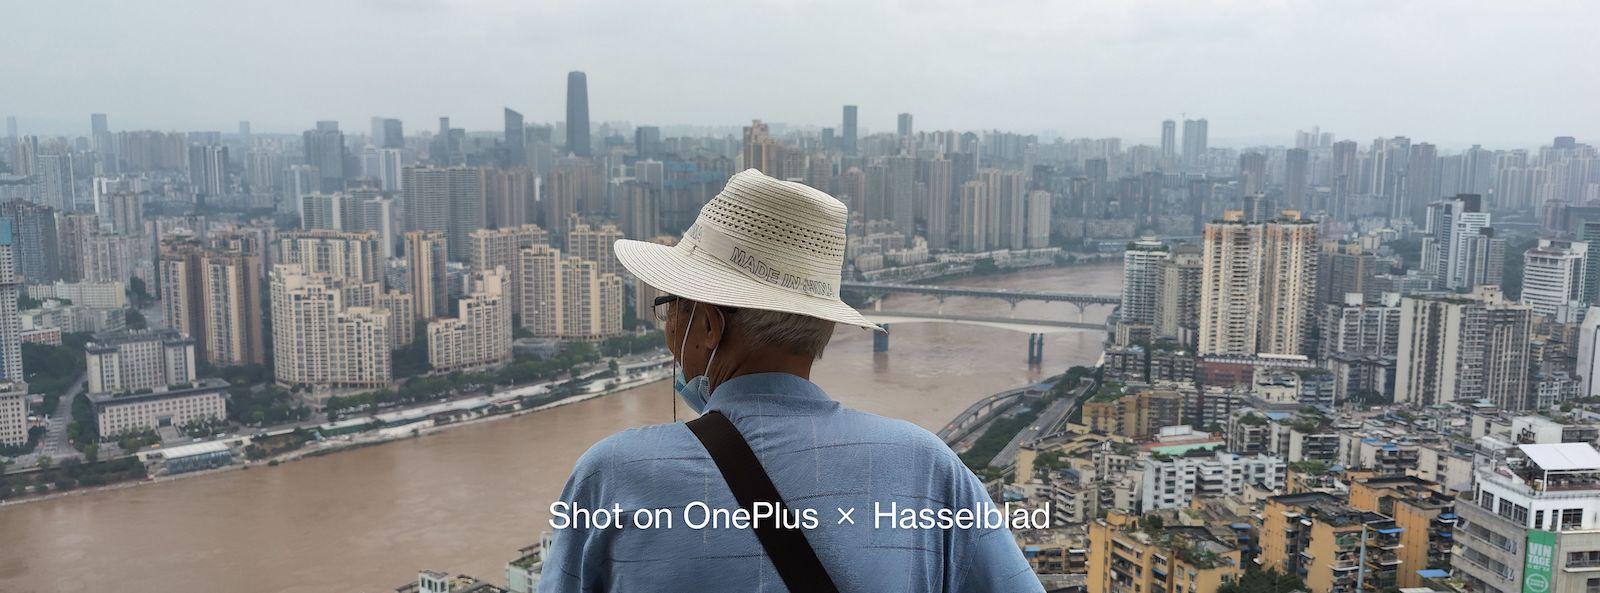 OnePlus Hasselblad XPan Mode